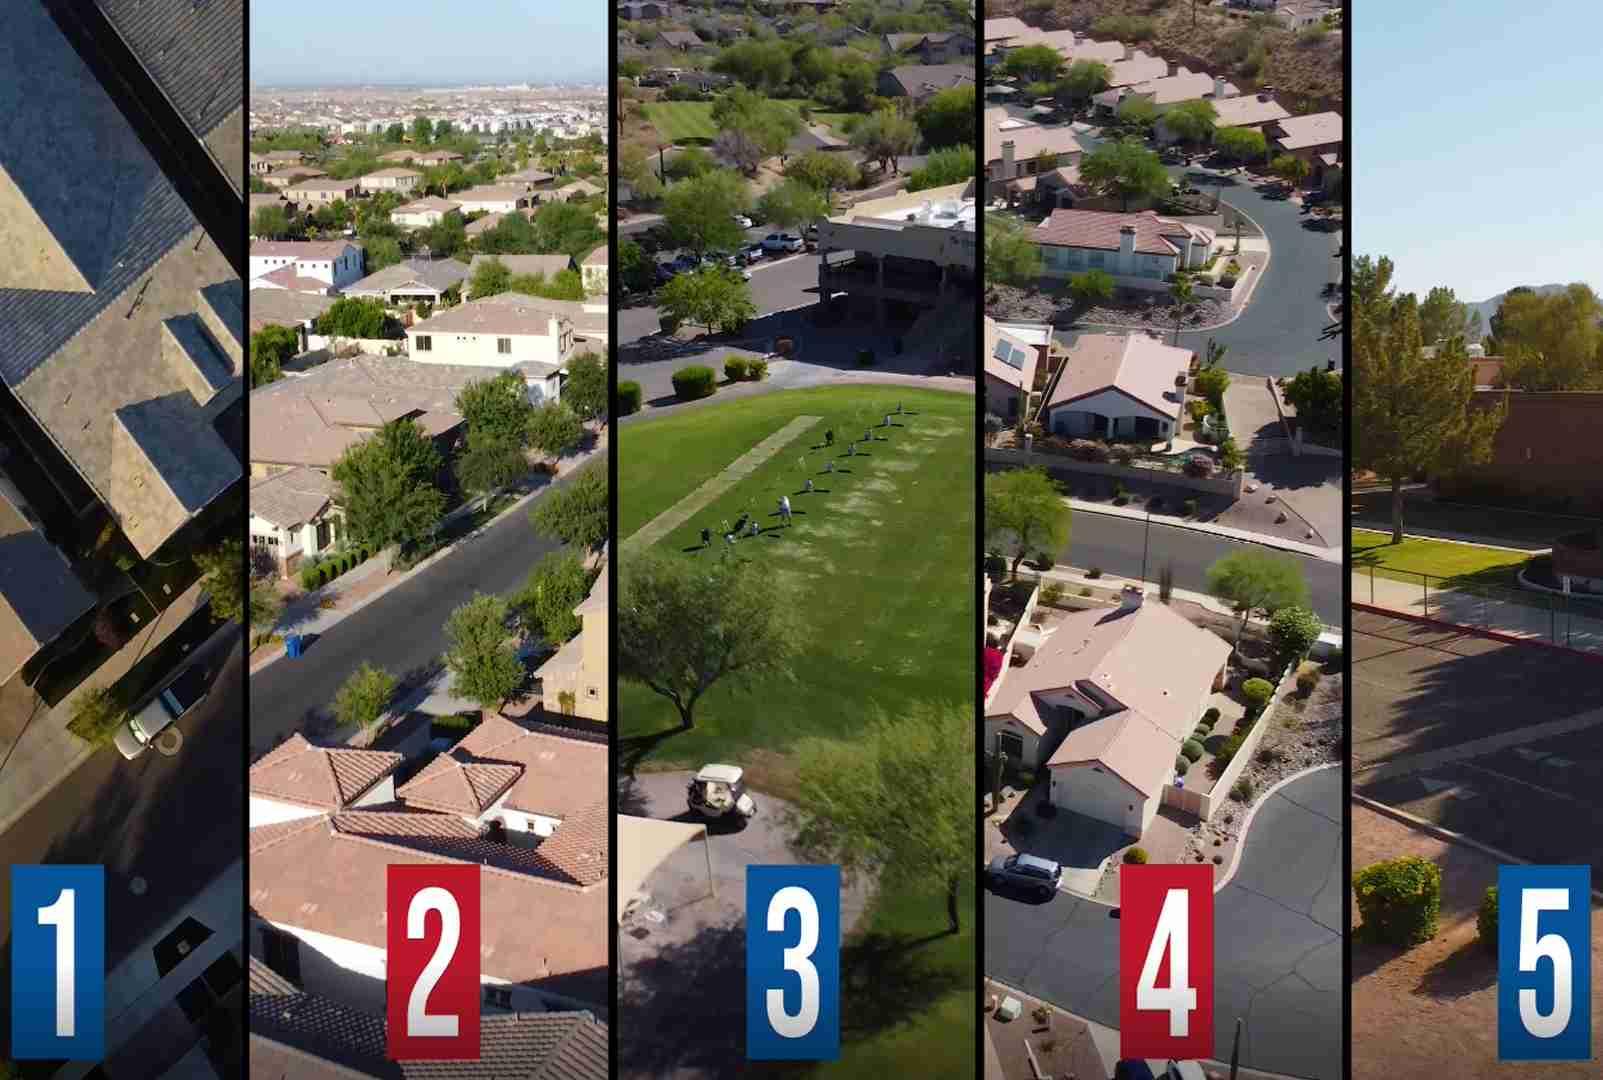 mesa arizona neighborhoods, homes in mesa arizona